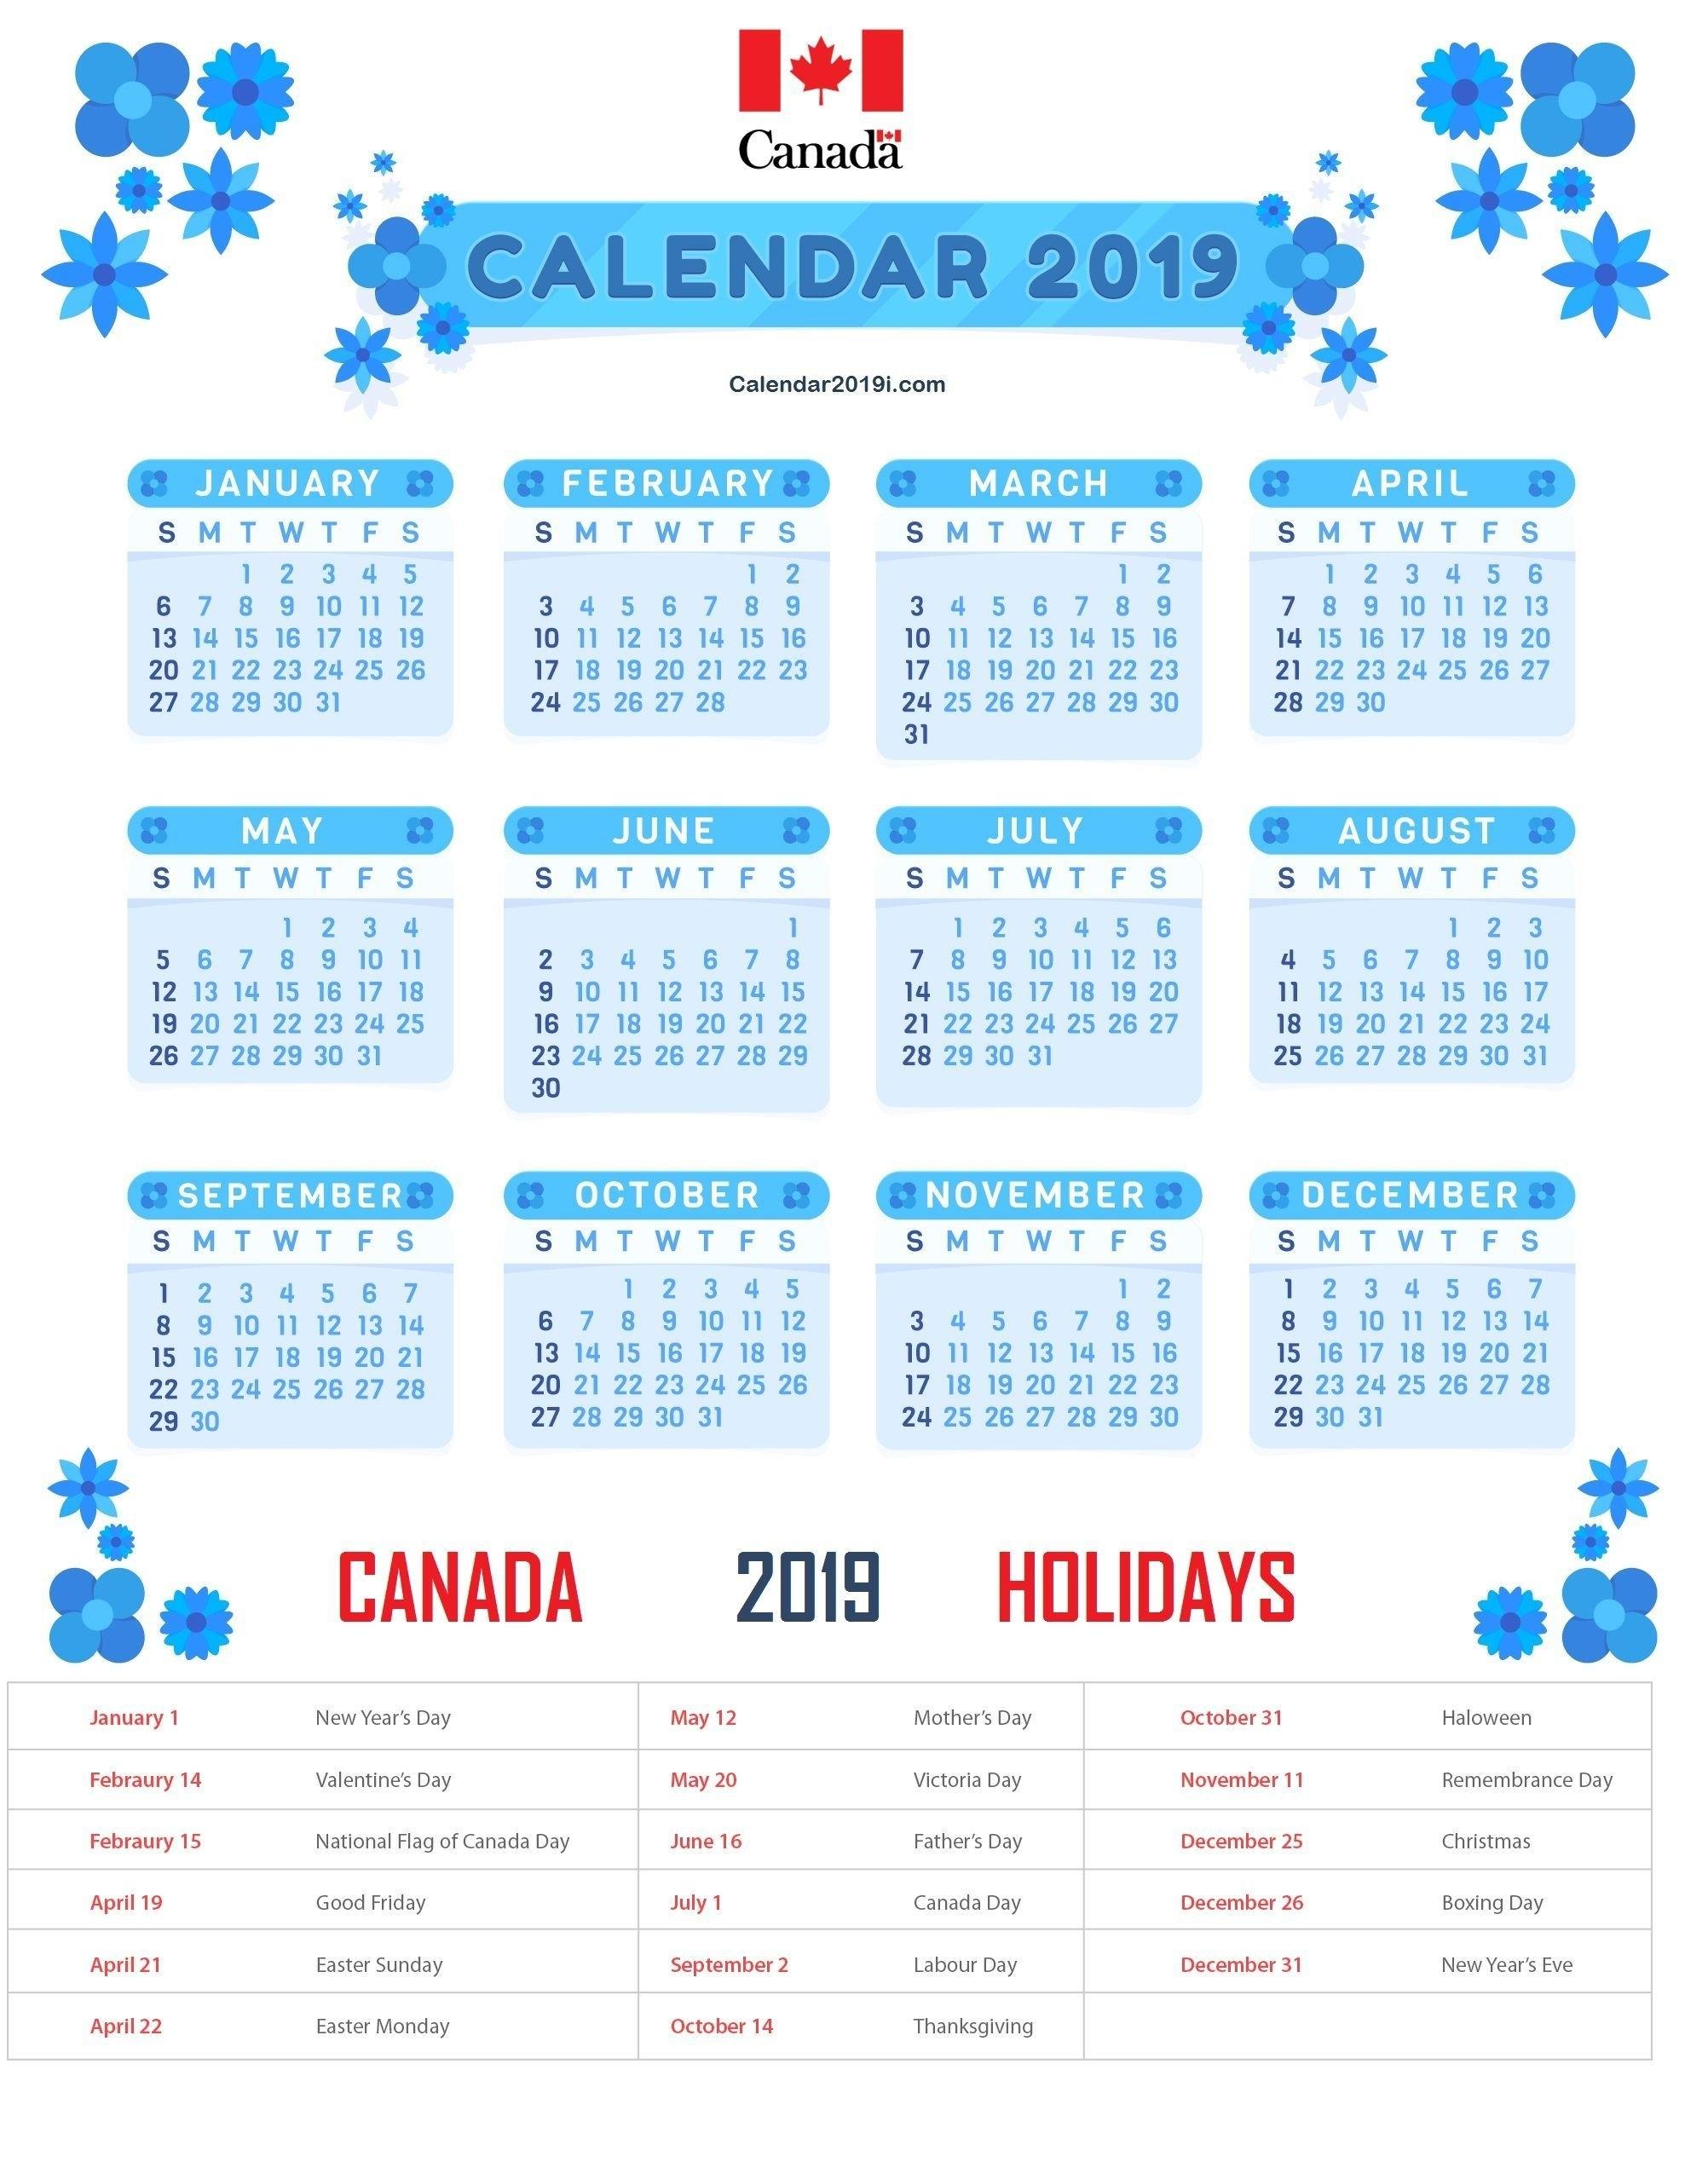 Canada Holidays Calendar 2019 Template #canadacalendar Calendar 2019 Canada Holidays